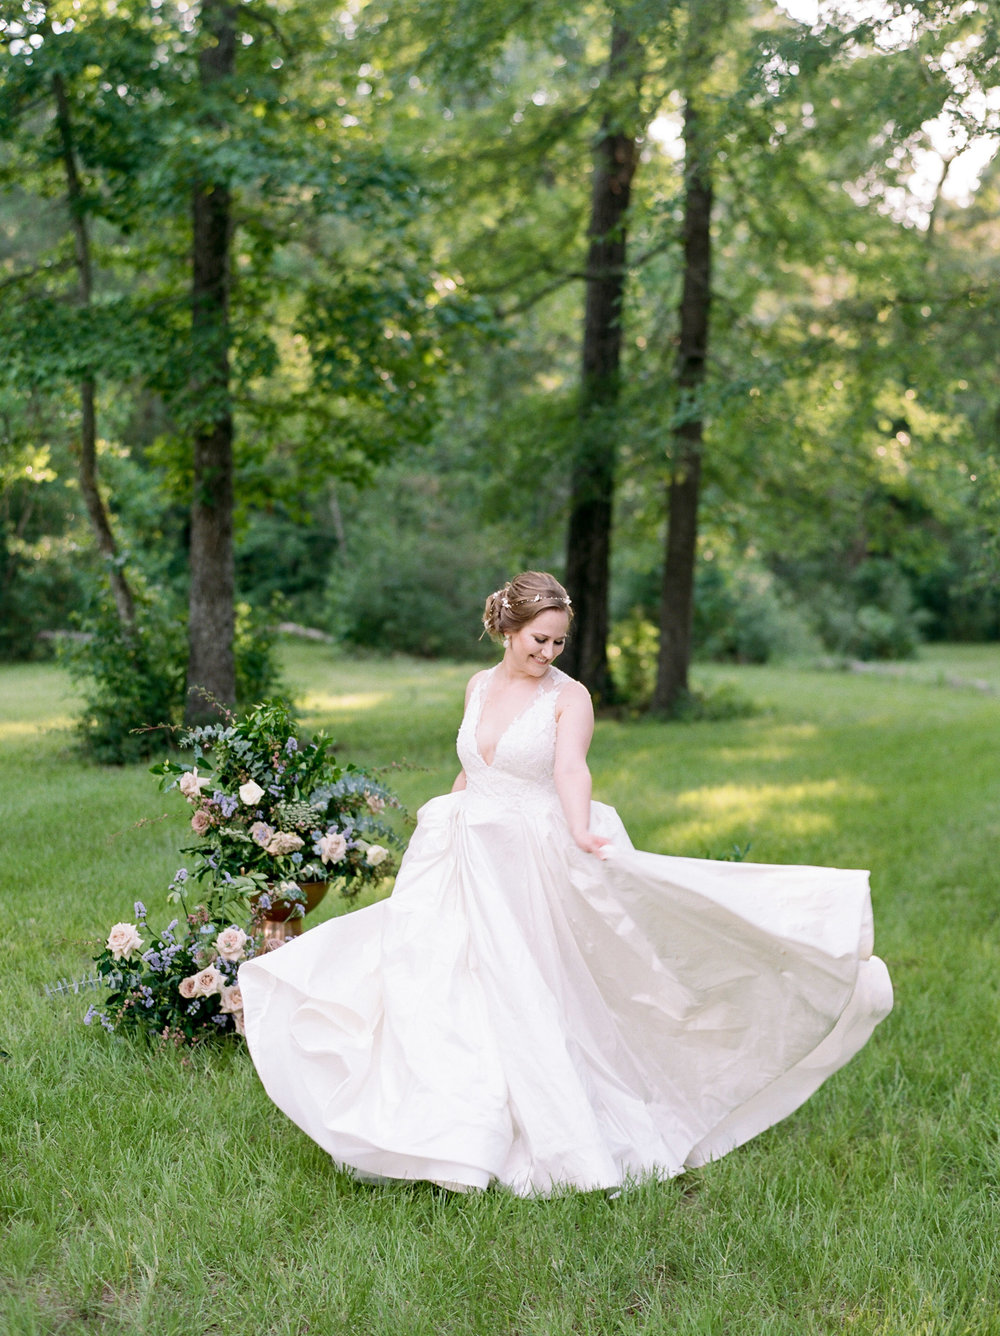 Houston-Fine-Art-Film-Destination-Wedding-Photographer-Top-Best-Luxury-Josh-Dana-Fernandez-Photographer-Austin-Texas-2.jpg